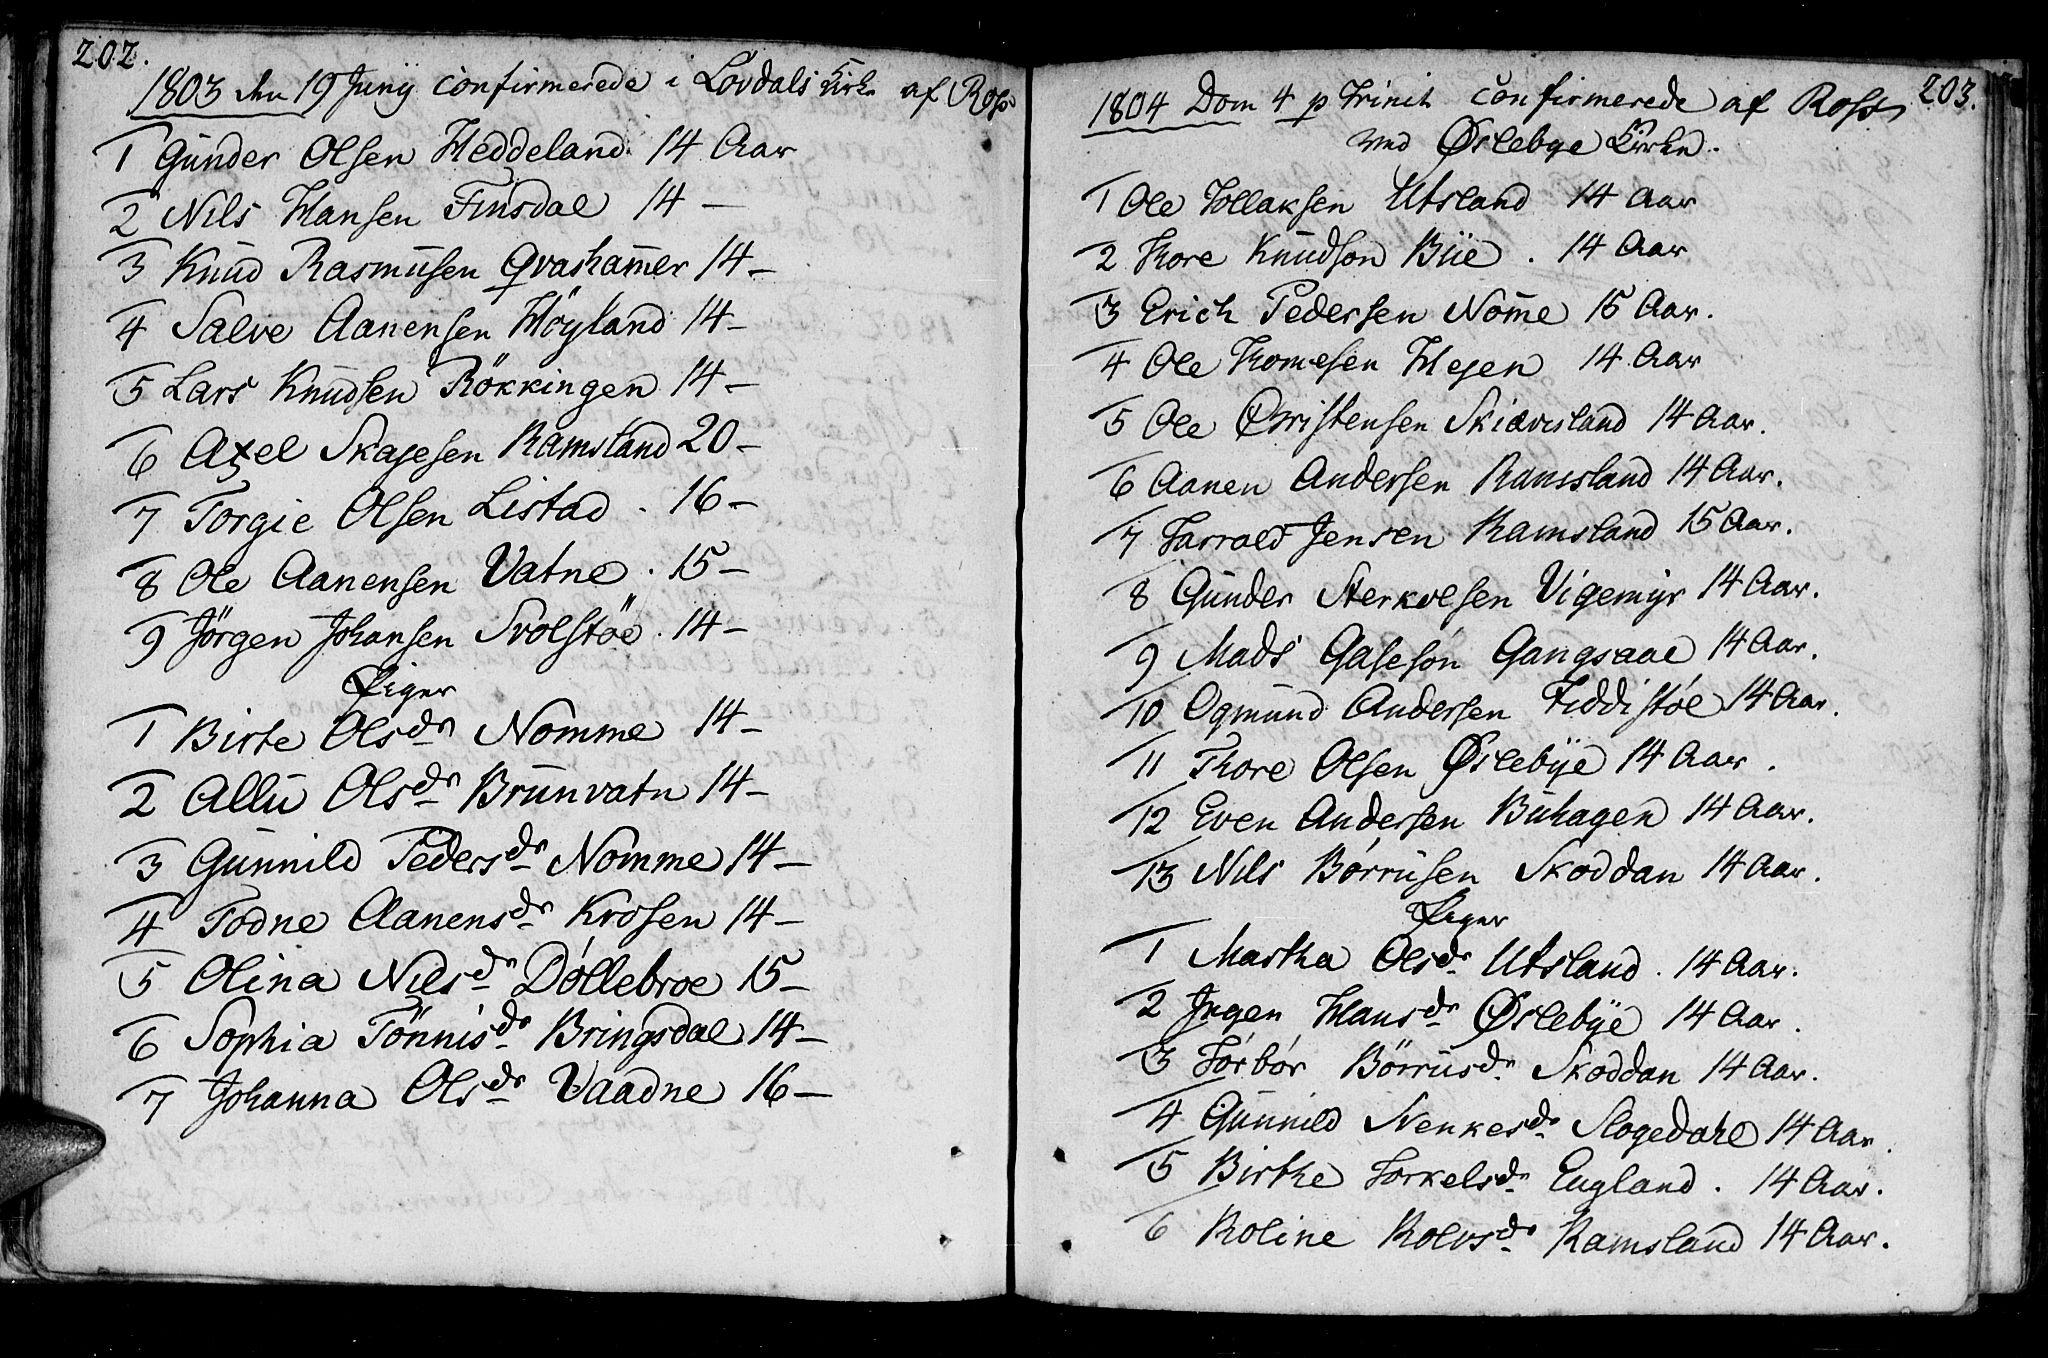 SAK, Holum sokneprestkontor, F/Fa/Fac/L0001: Ministerialbok nr. A 1, 1773-1820, s. 202-203